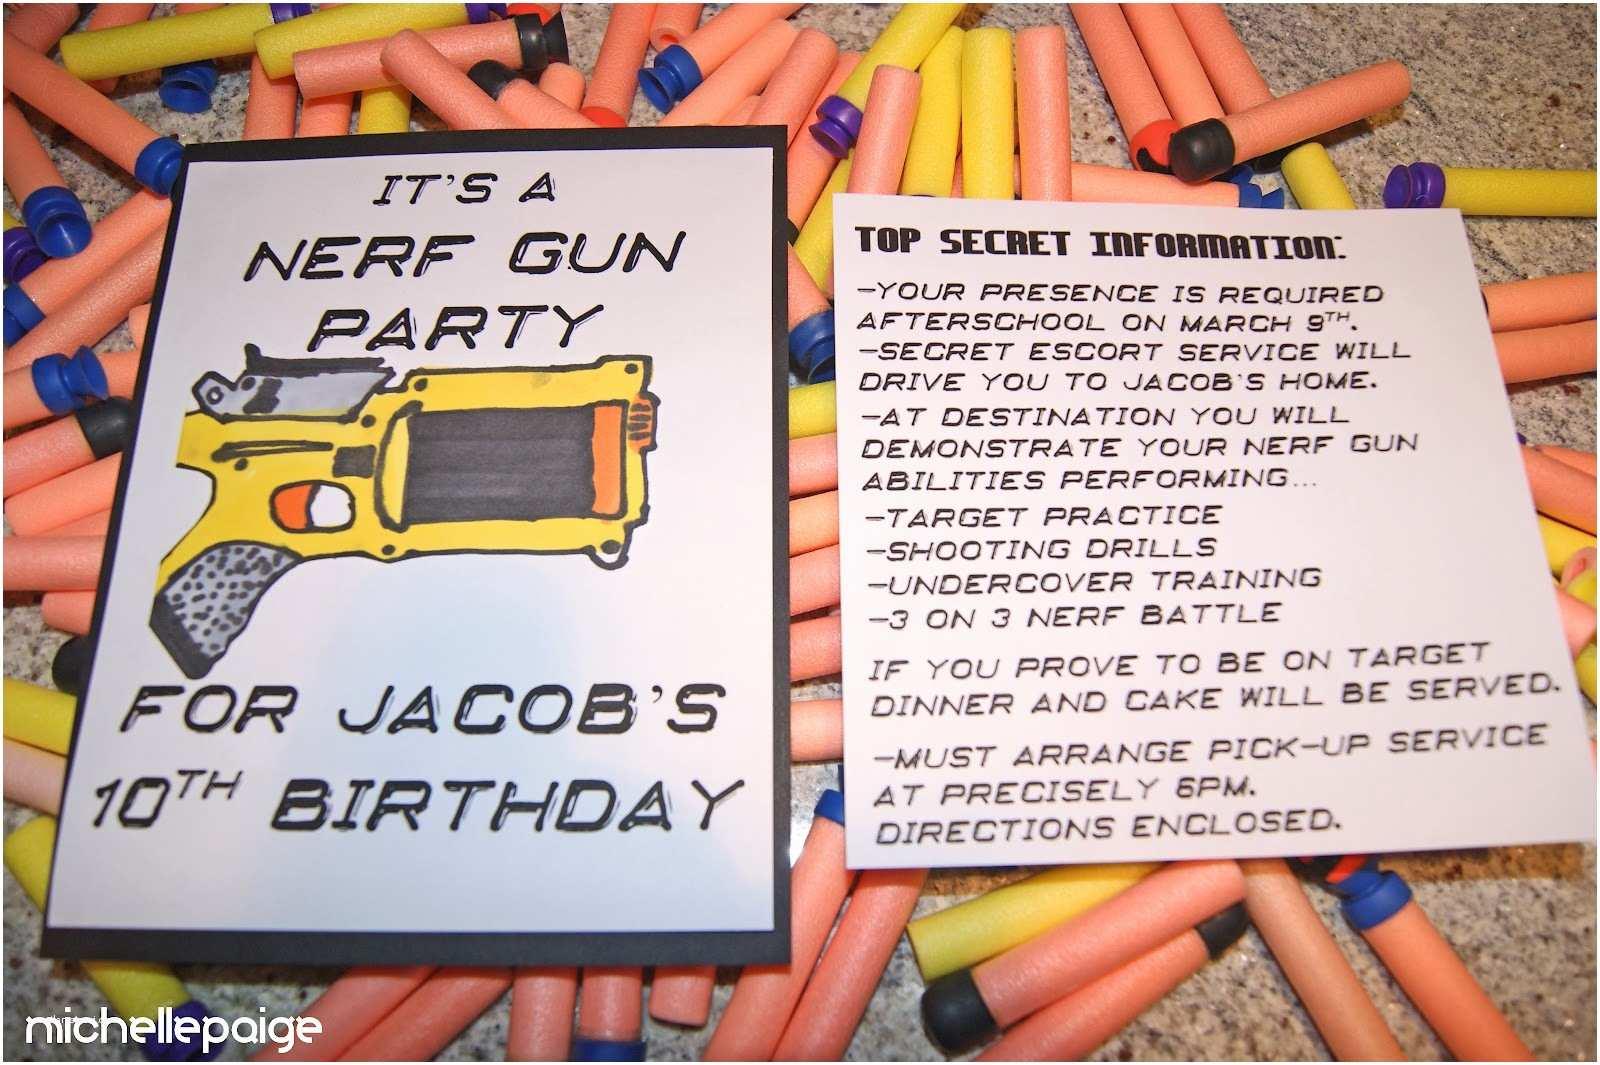 Nerf Gun Party Invitations Michelle Paige Blogs Nerf Gun Party